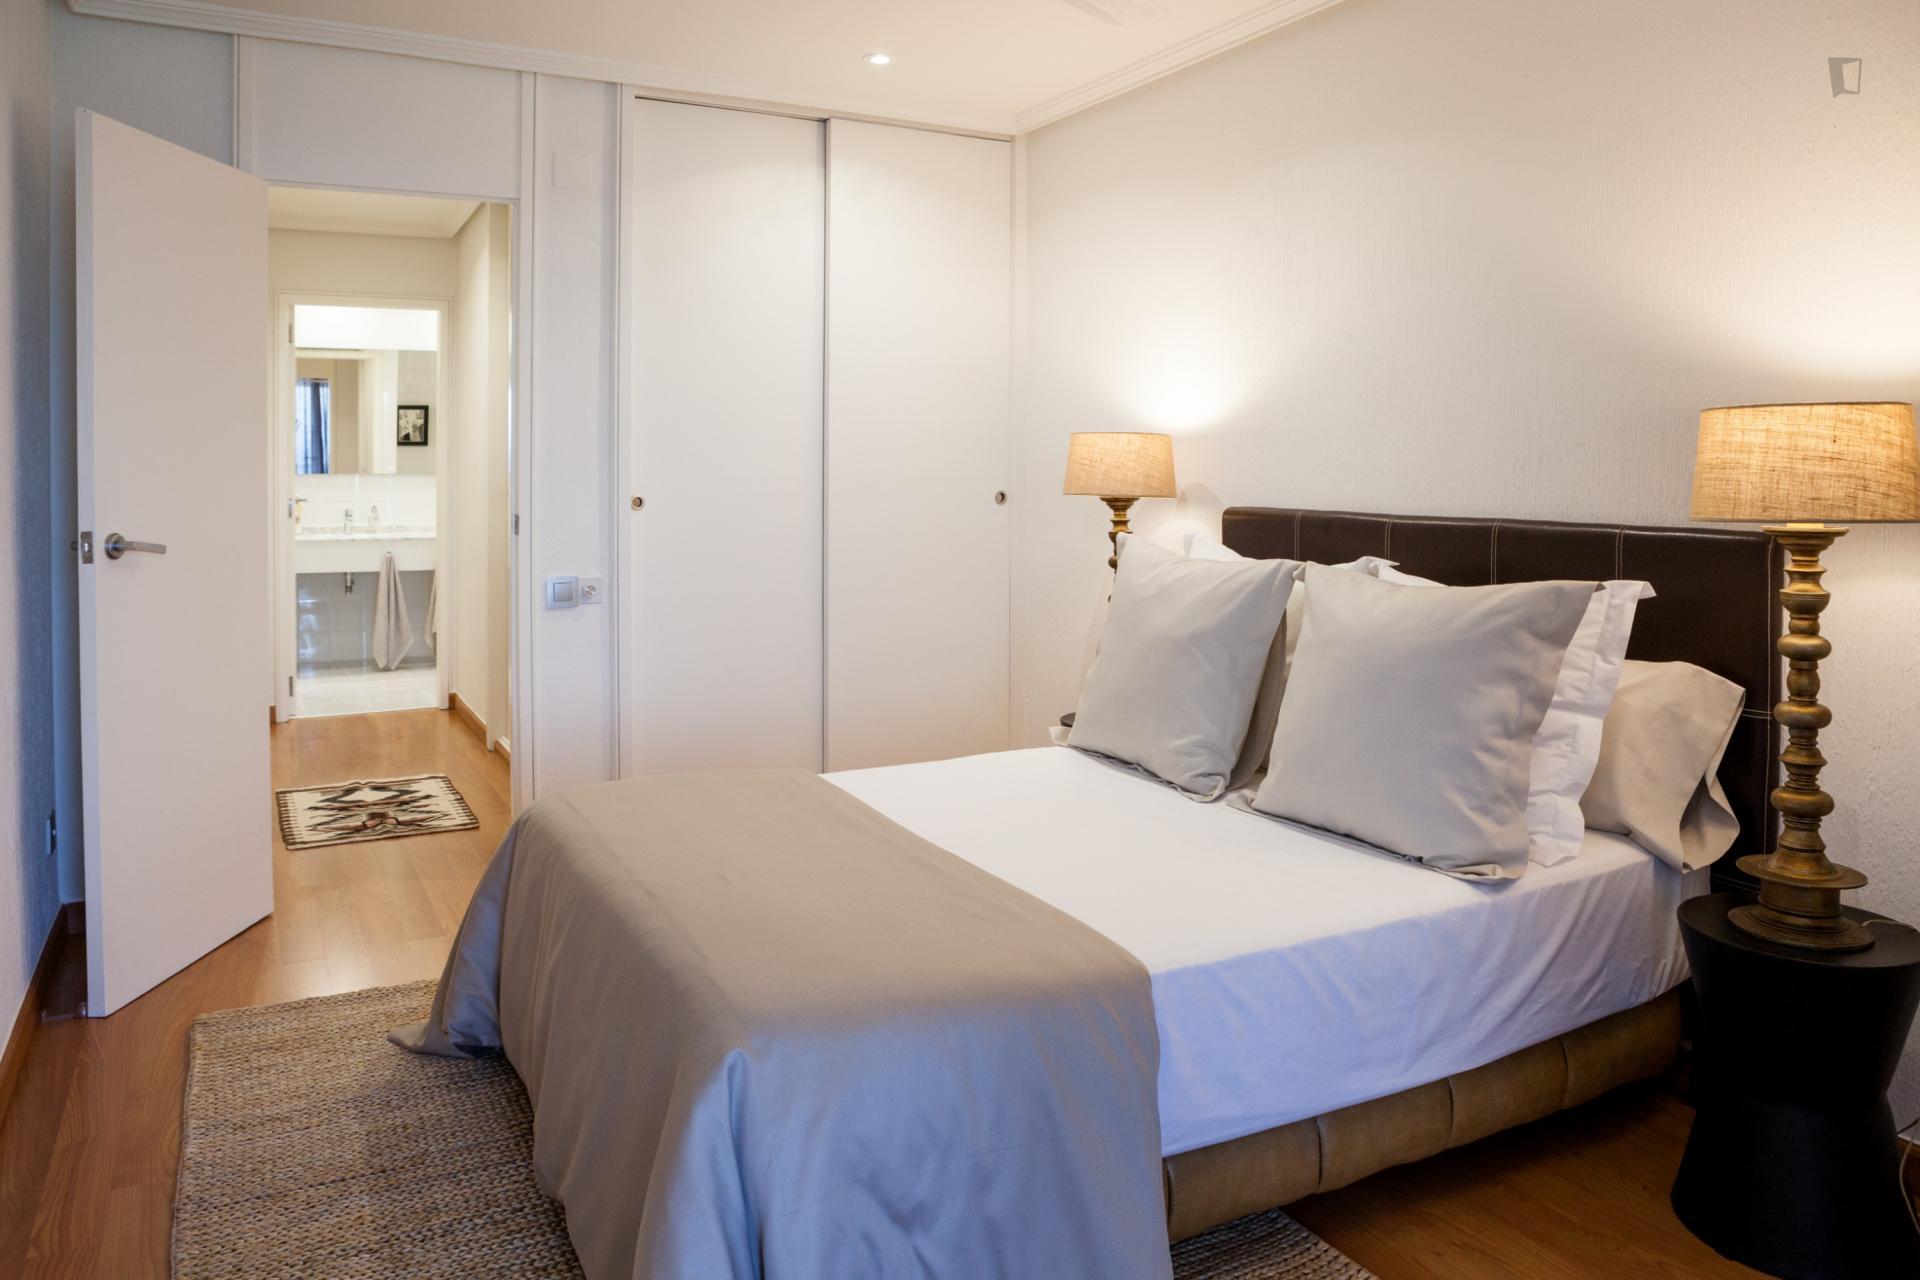 Postiguet - 3 Bedroom apartment in Alicante